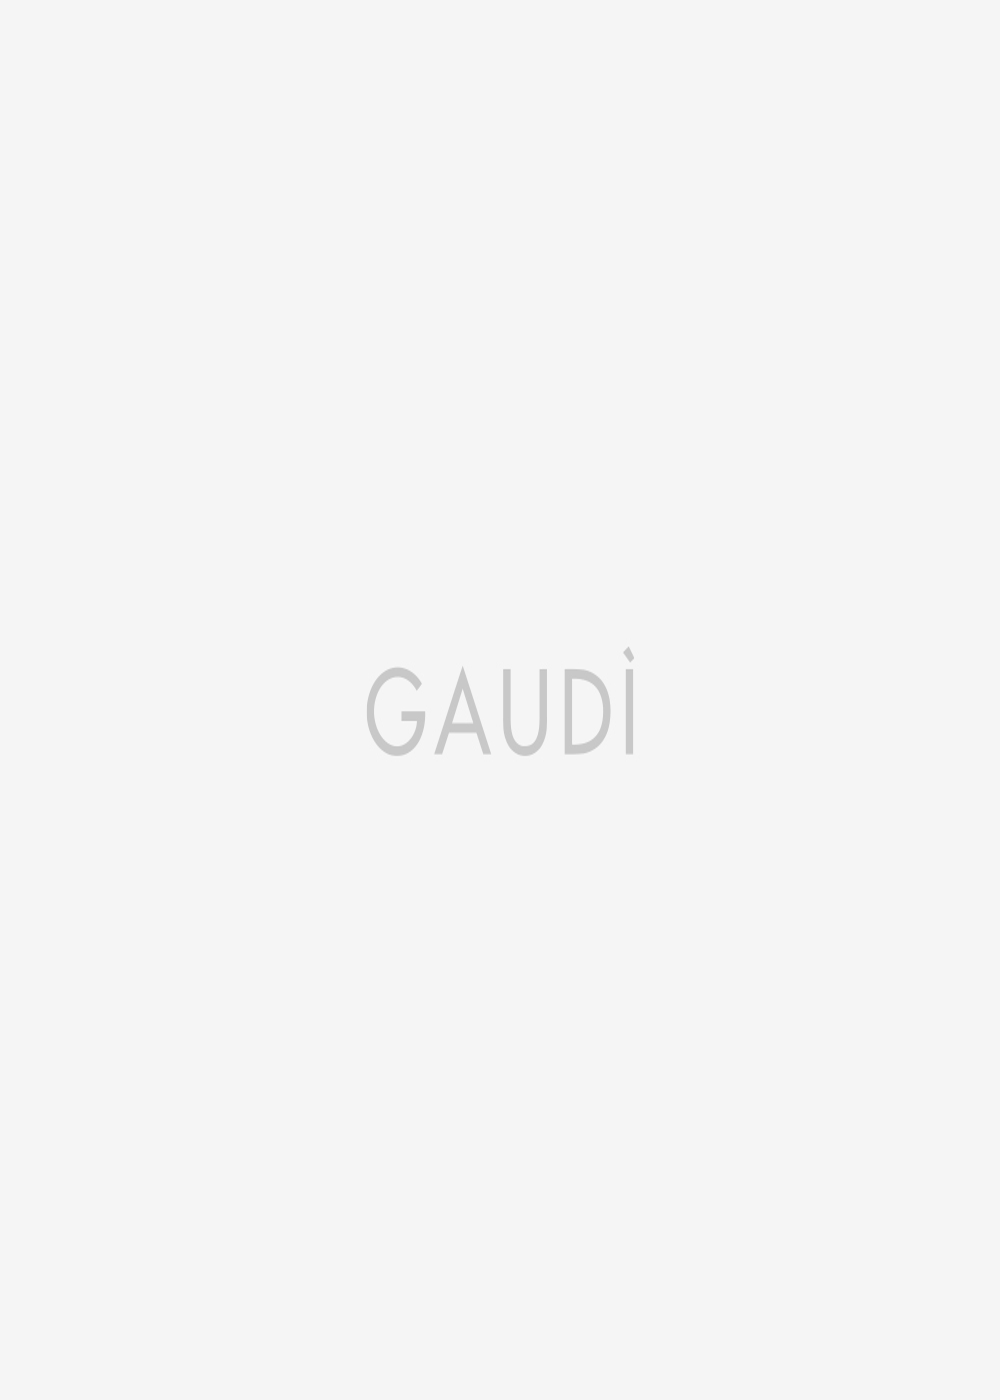 Long Sleeve Sweater Gaudì Fashion